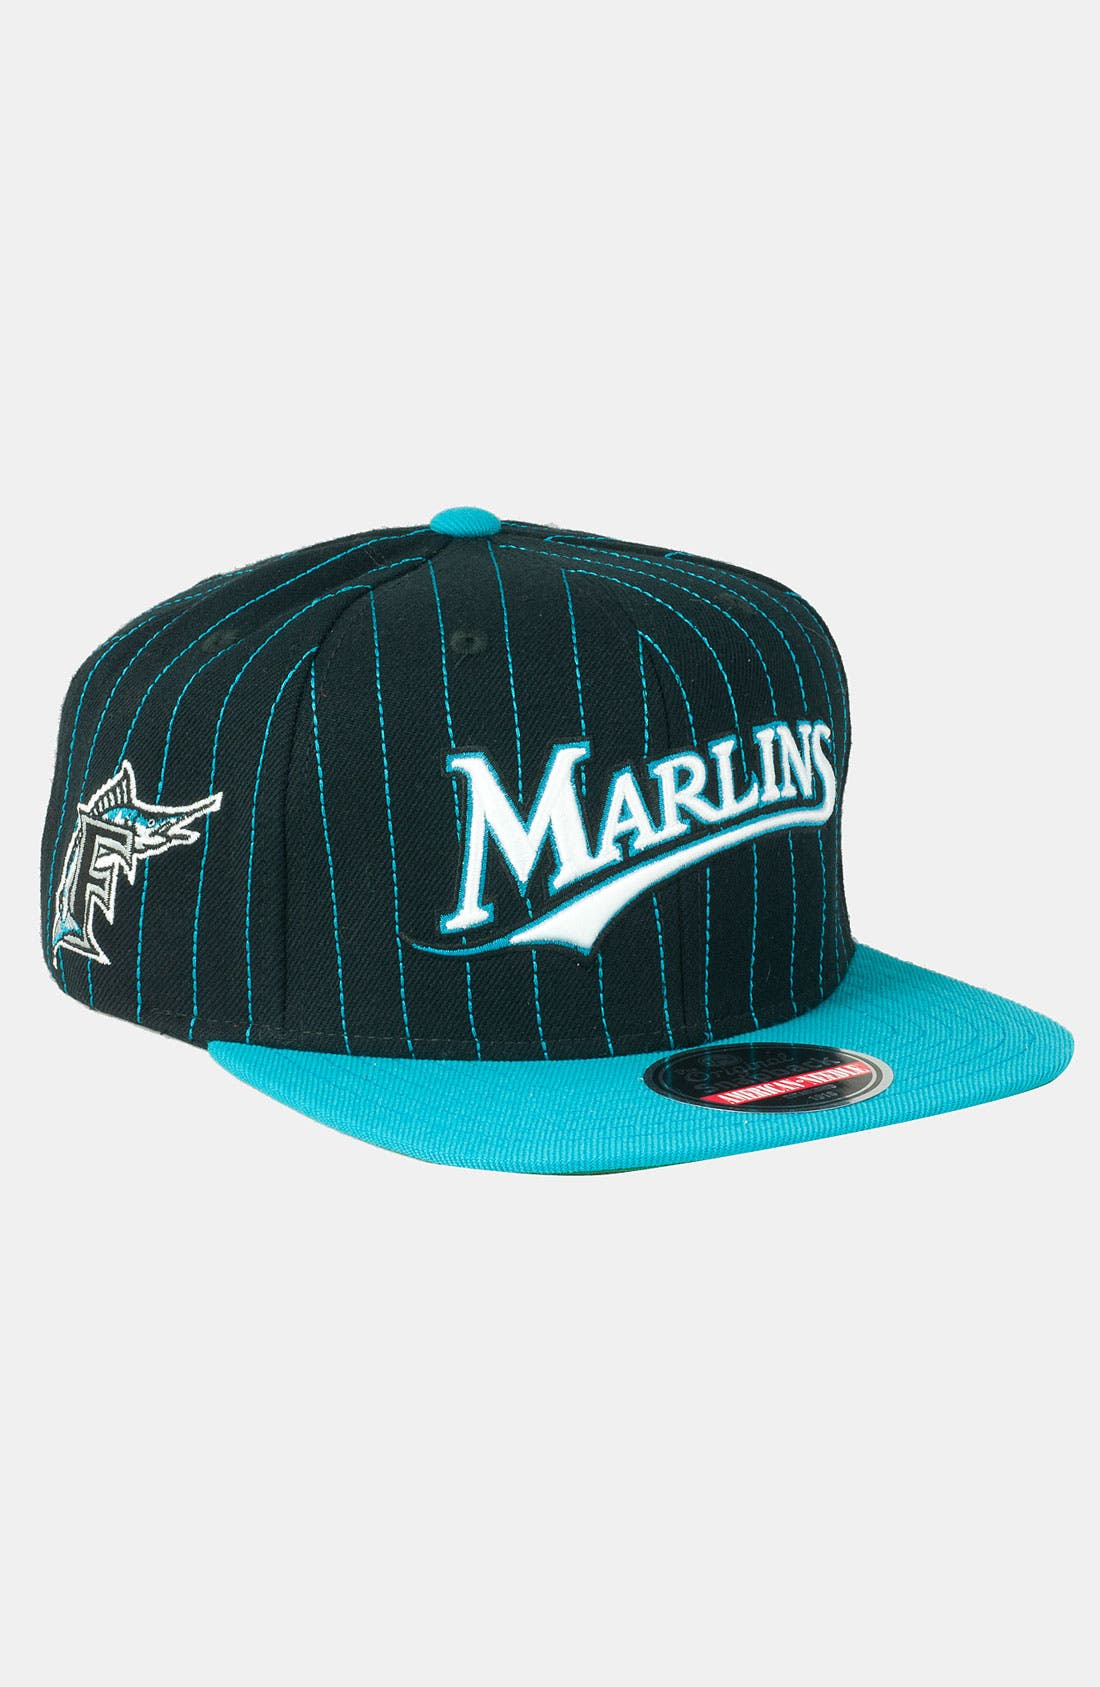 Alternate Image 1 Selected - American Needle 'Marlins' Snapback Baseball Cap